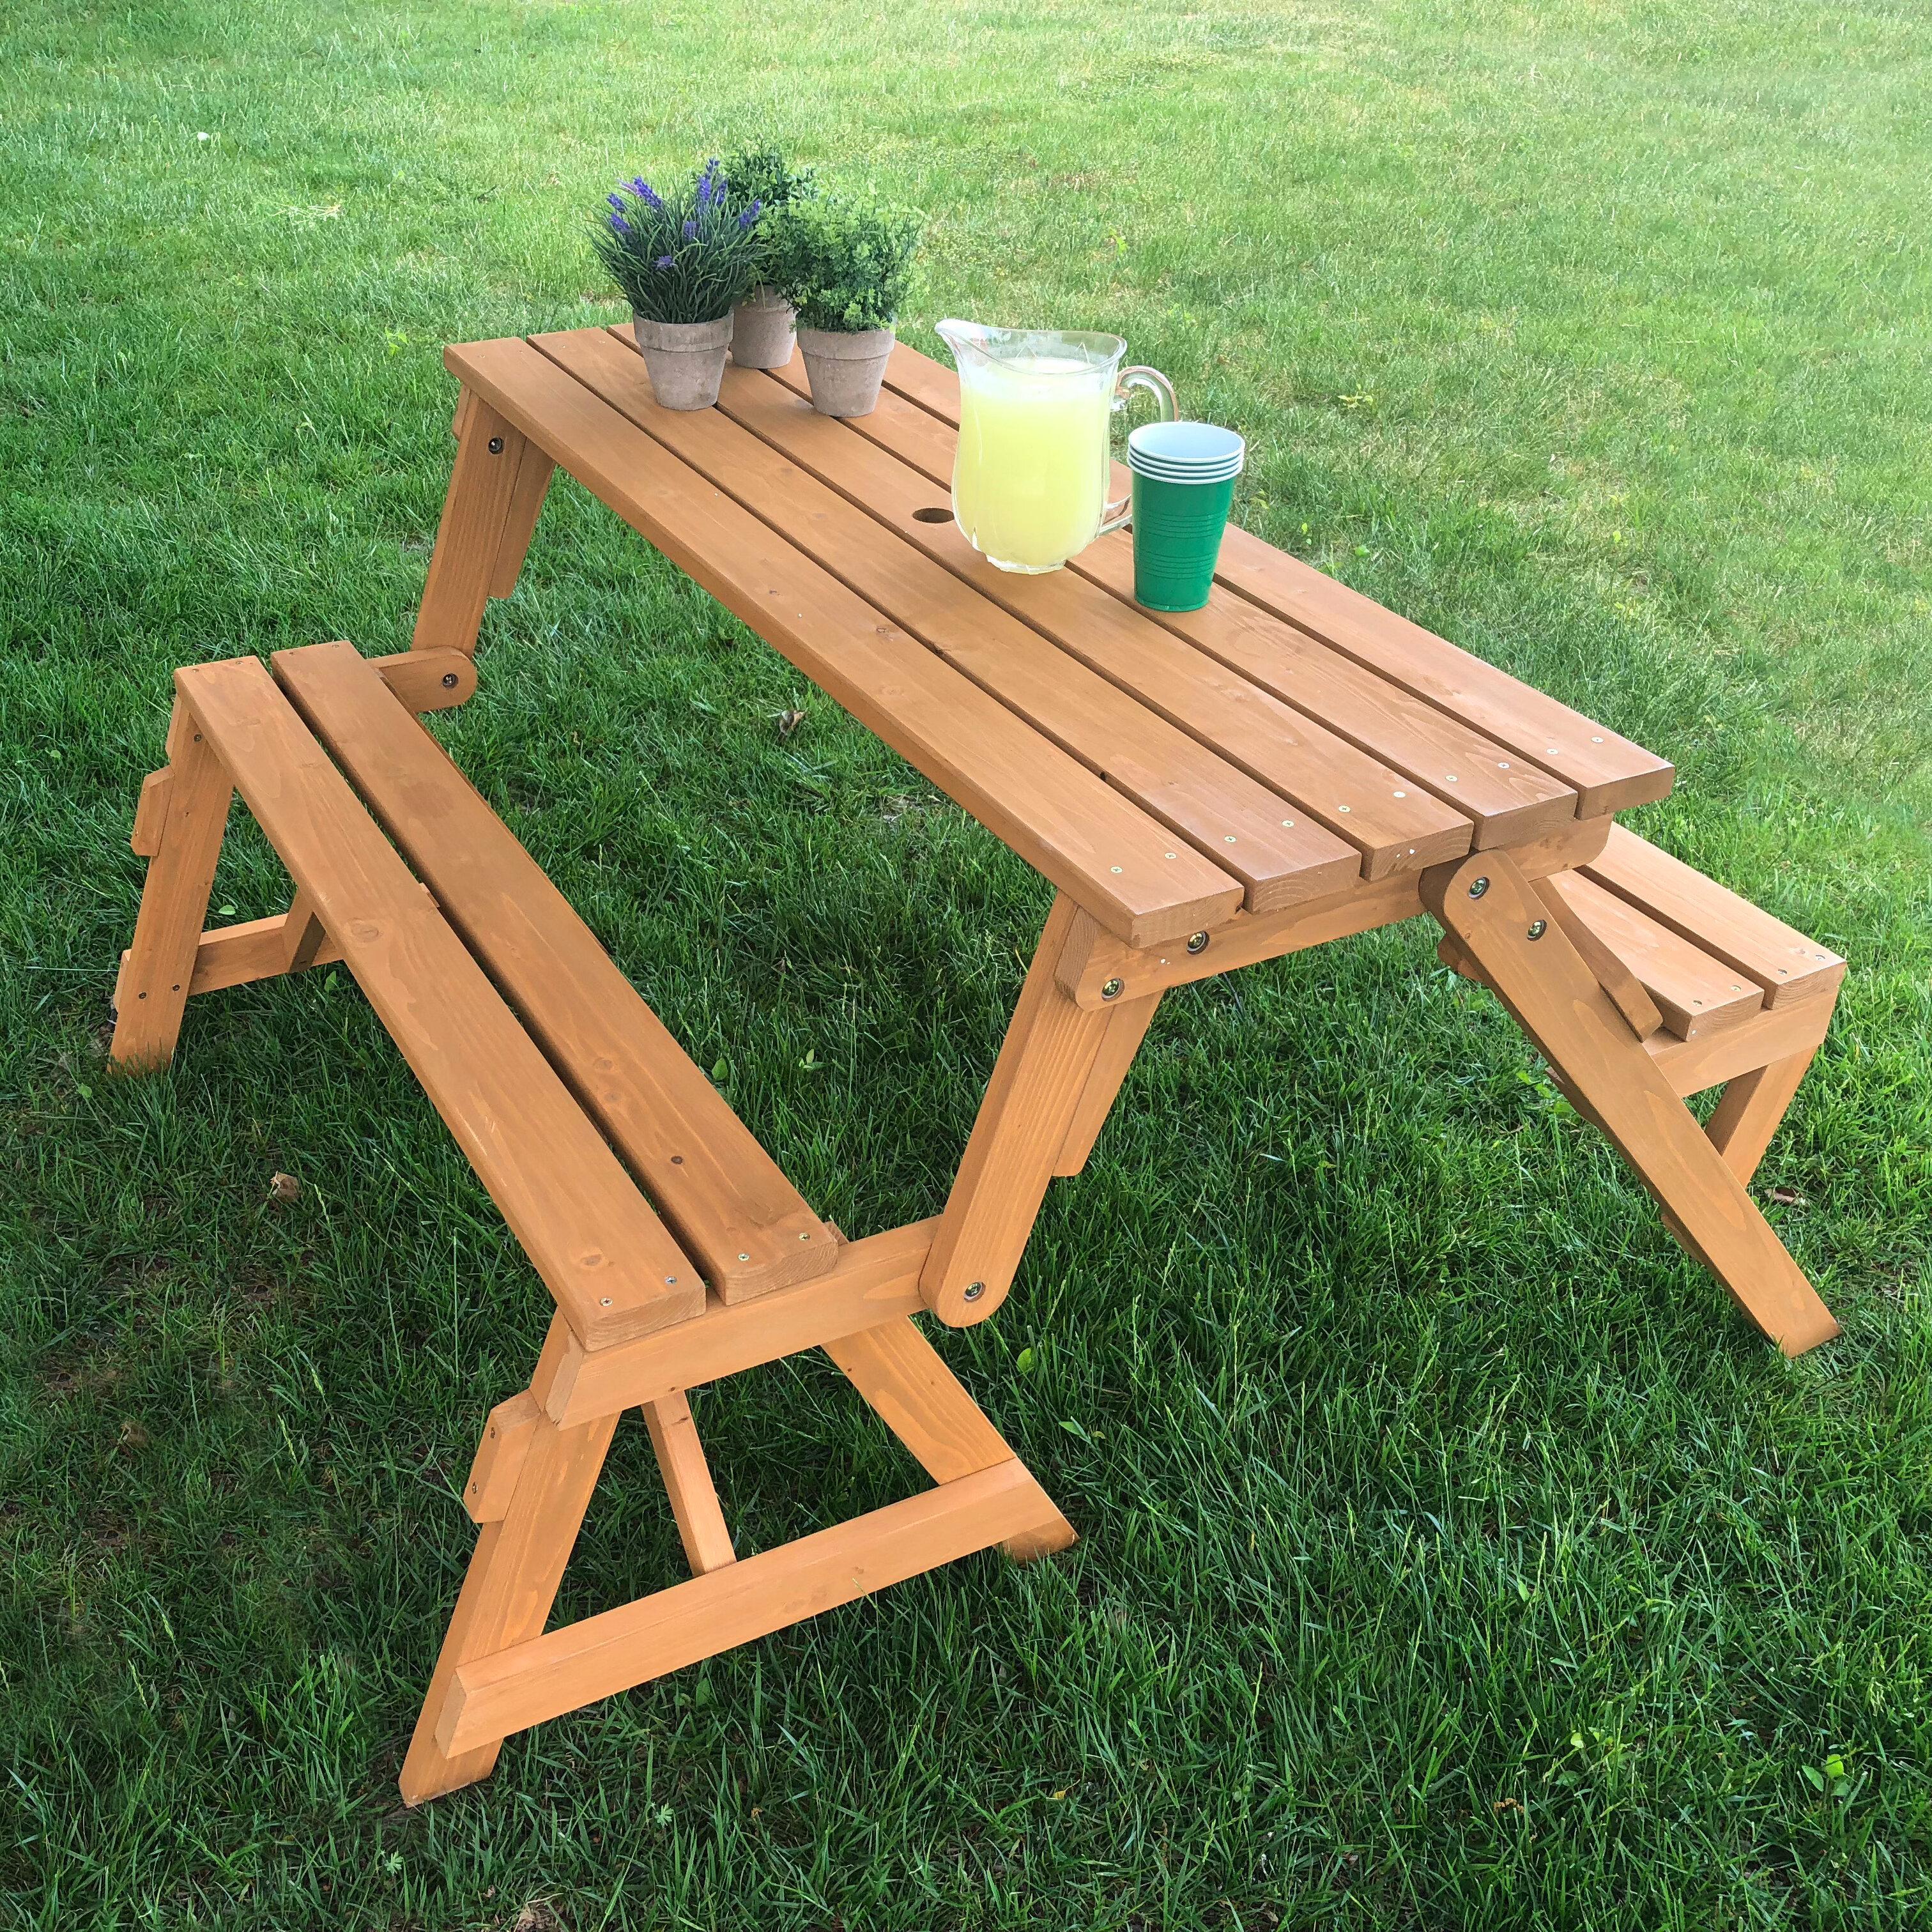 Tables en bois de jardin: Commercial Use - No | Wayfair.ca